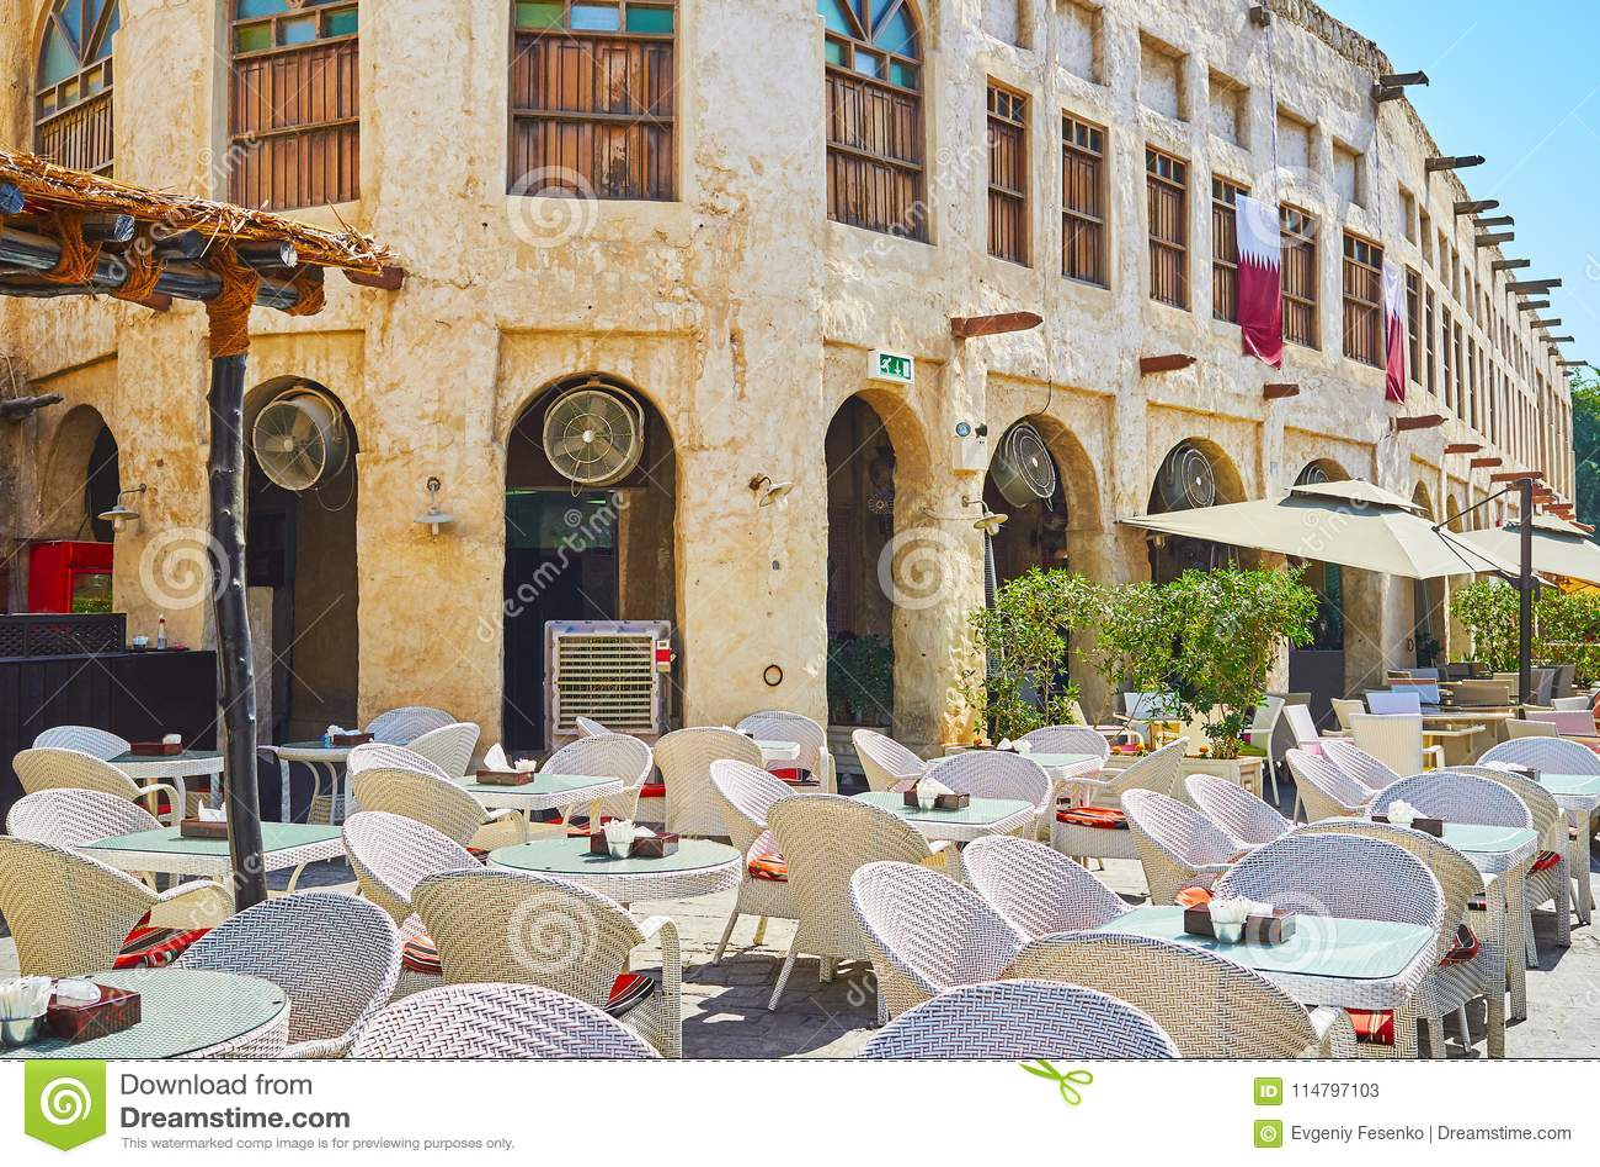 Relax In Restaurants Of Souq Waqif, Doha, Qatar Stock Image - Image